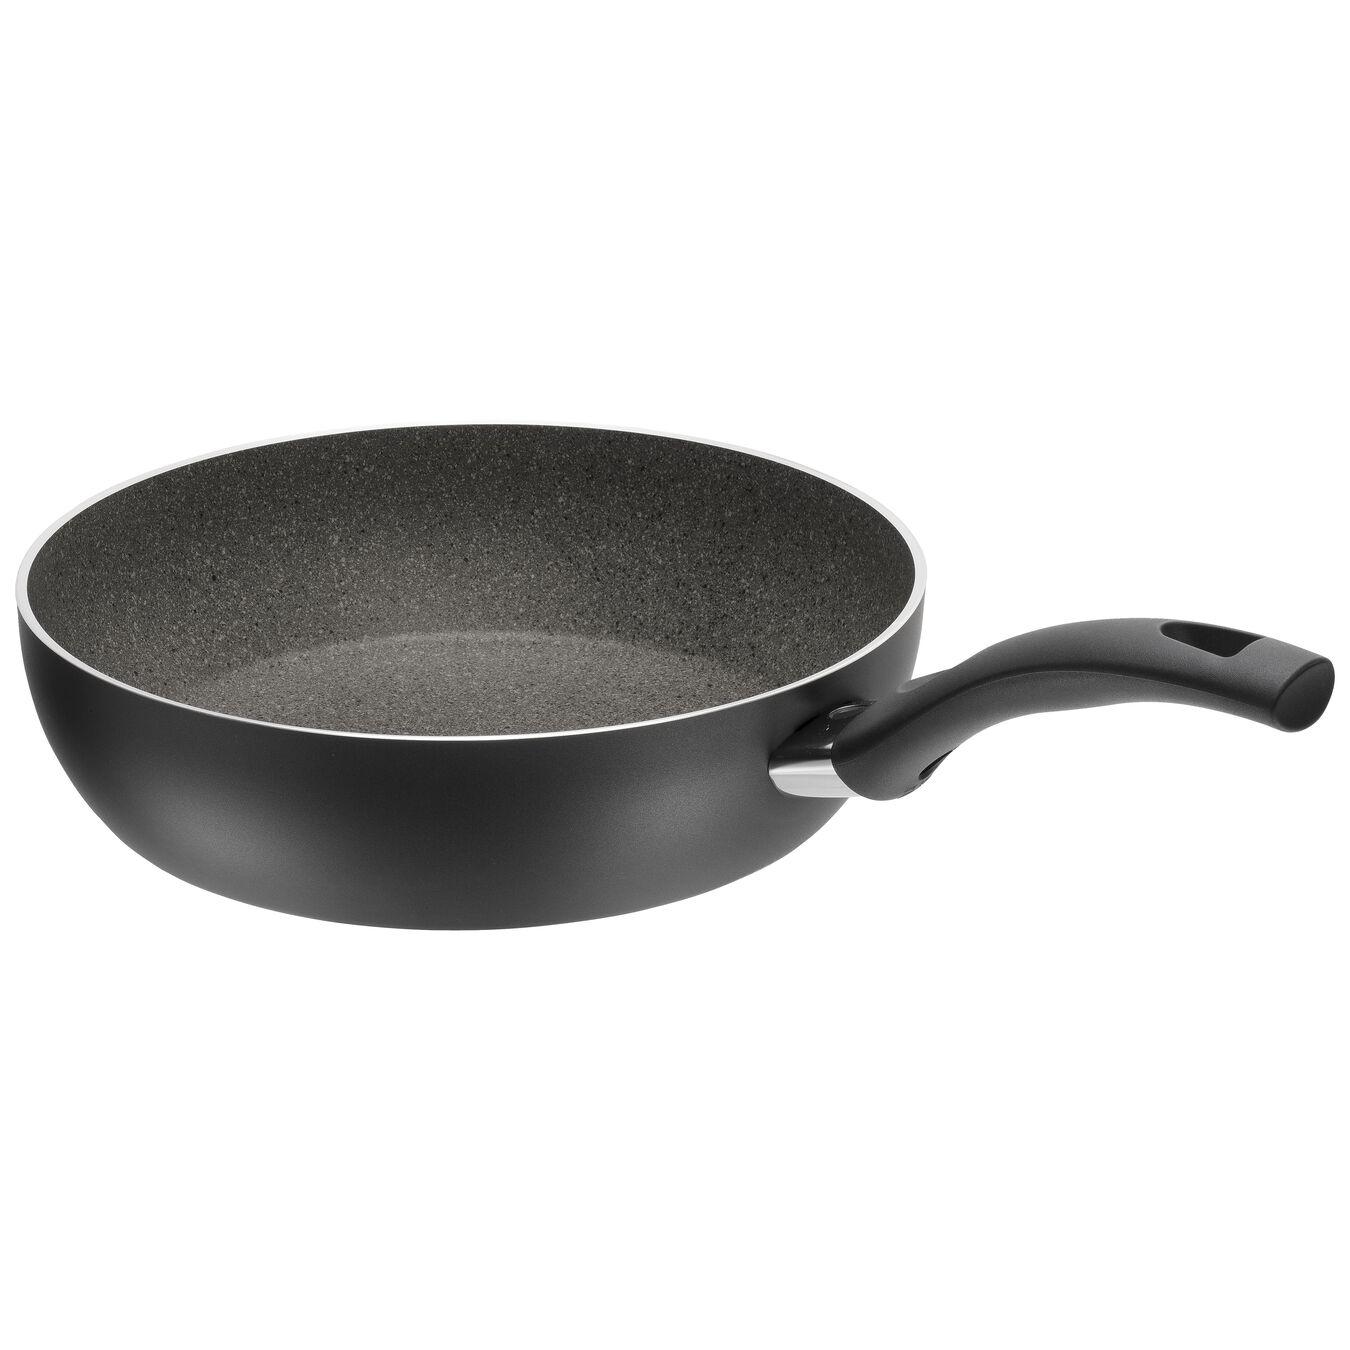 28 cm Aluminum Saute pan,,large 1